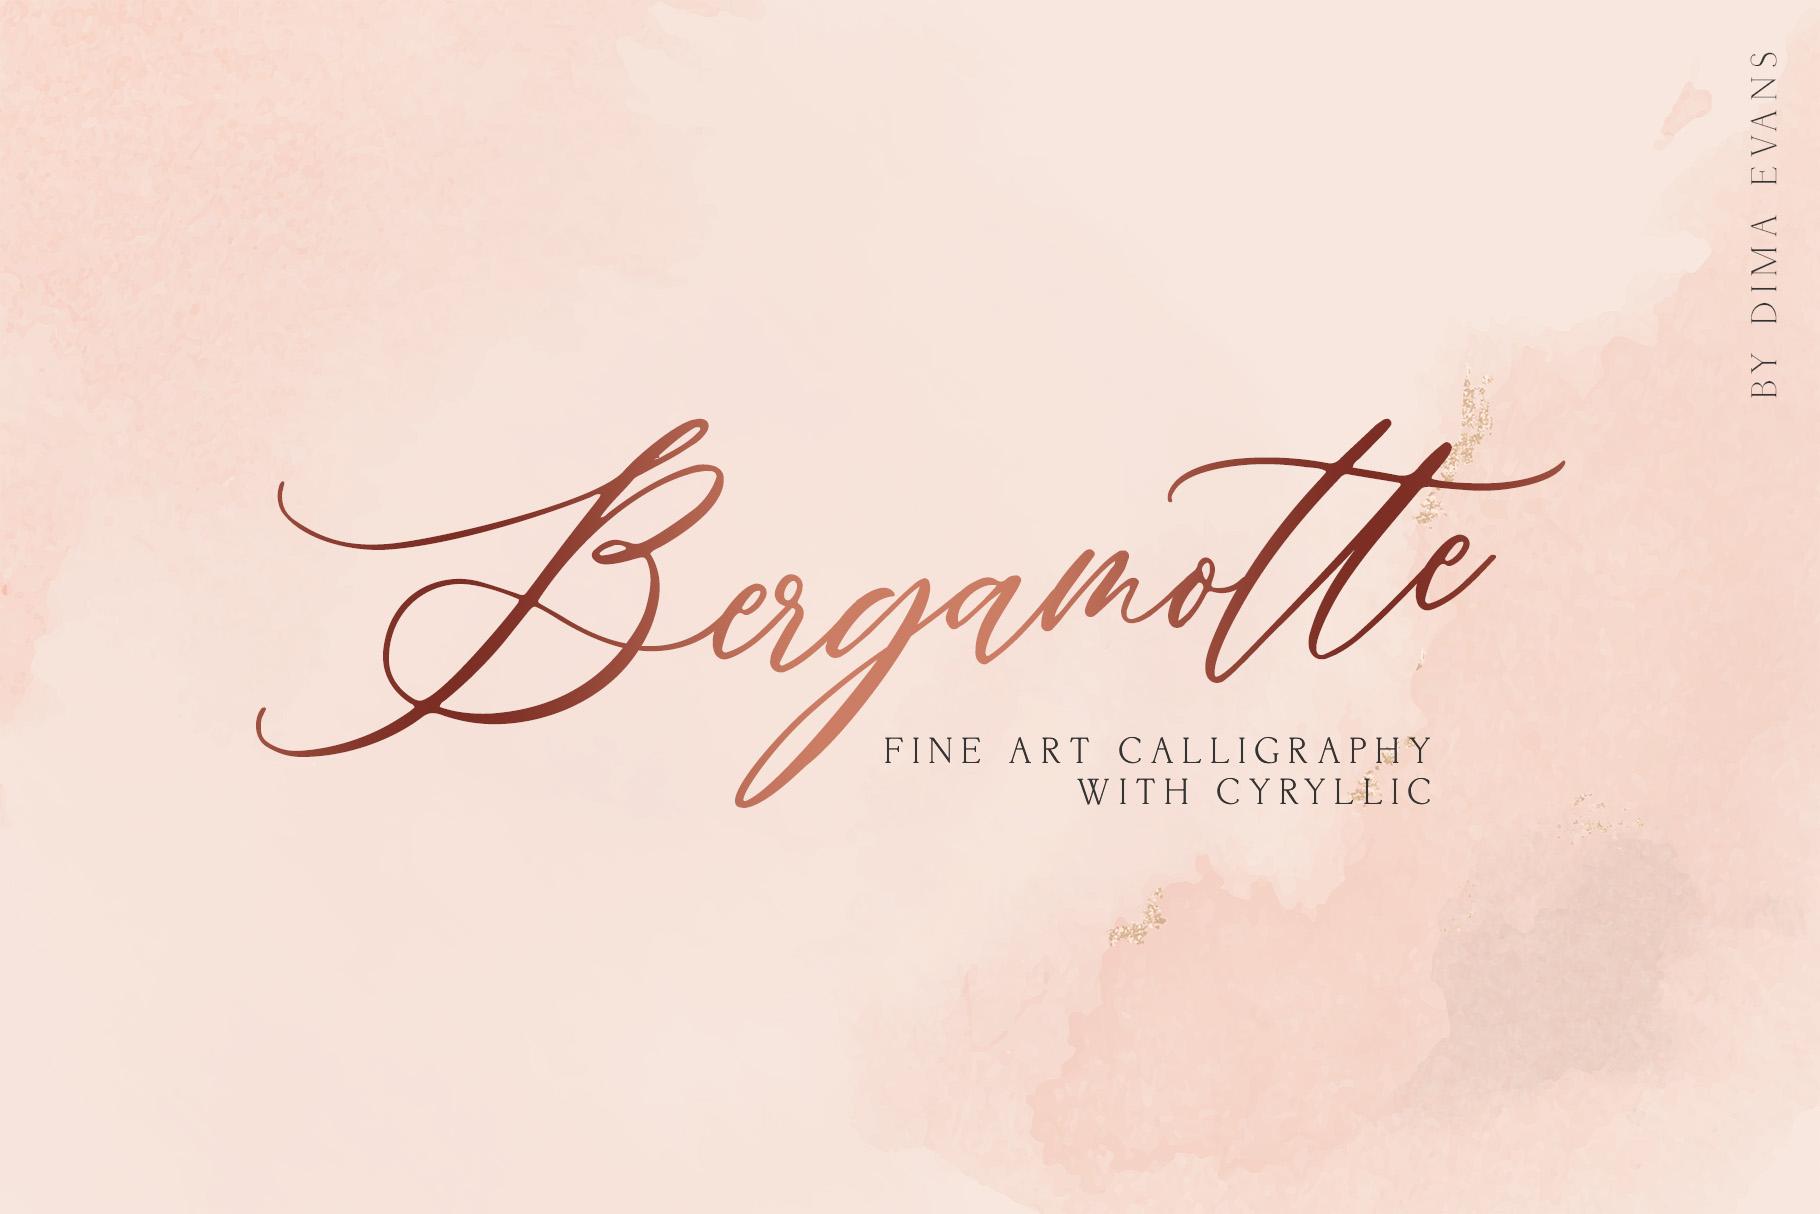 Bergamotte - Fine Art Calligraphy example image 1